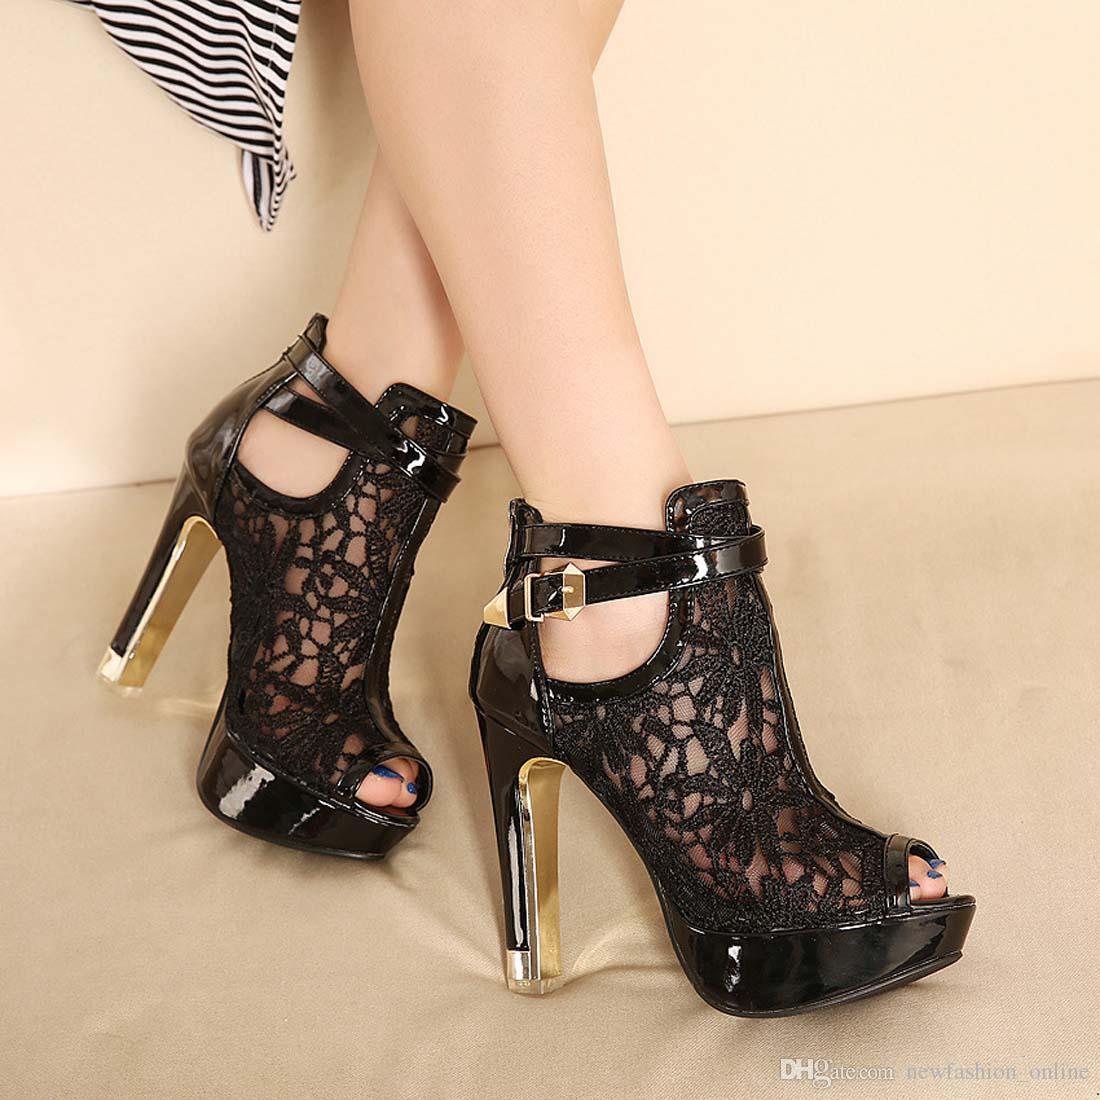 Black party sandals - Women Sandals Lace Lady Party Girl Shoes Platform White Black Wedding Shoes Stiletto High Heels Open Toe Dress Shoes Ankle Strap